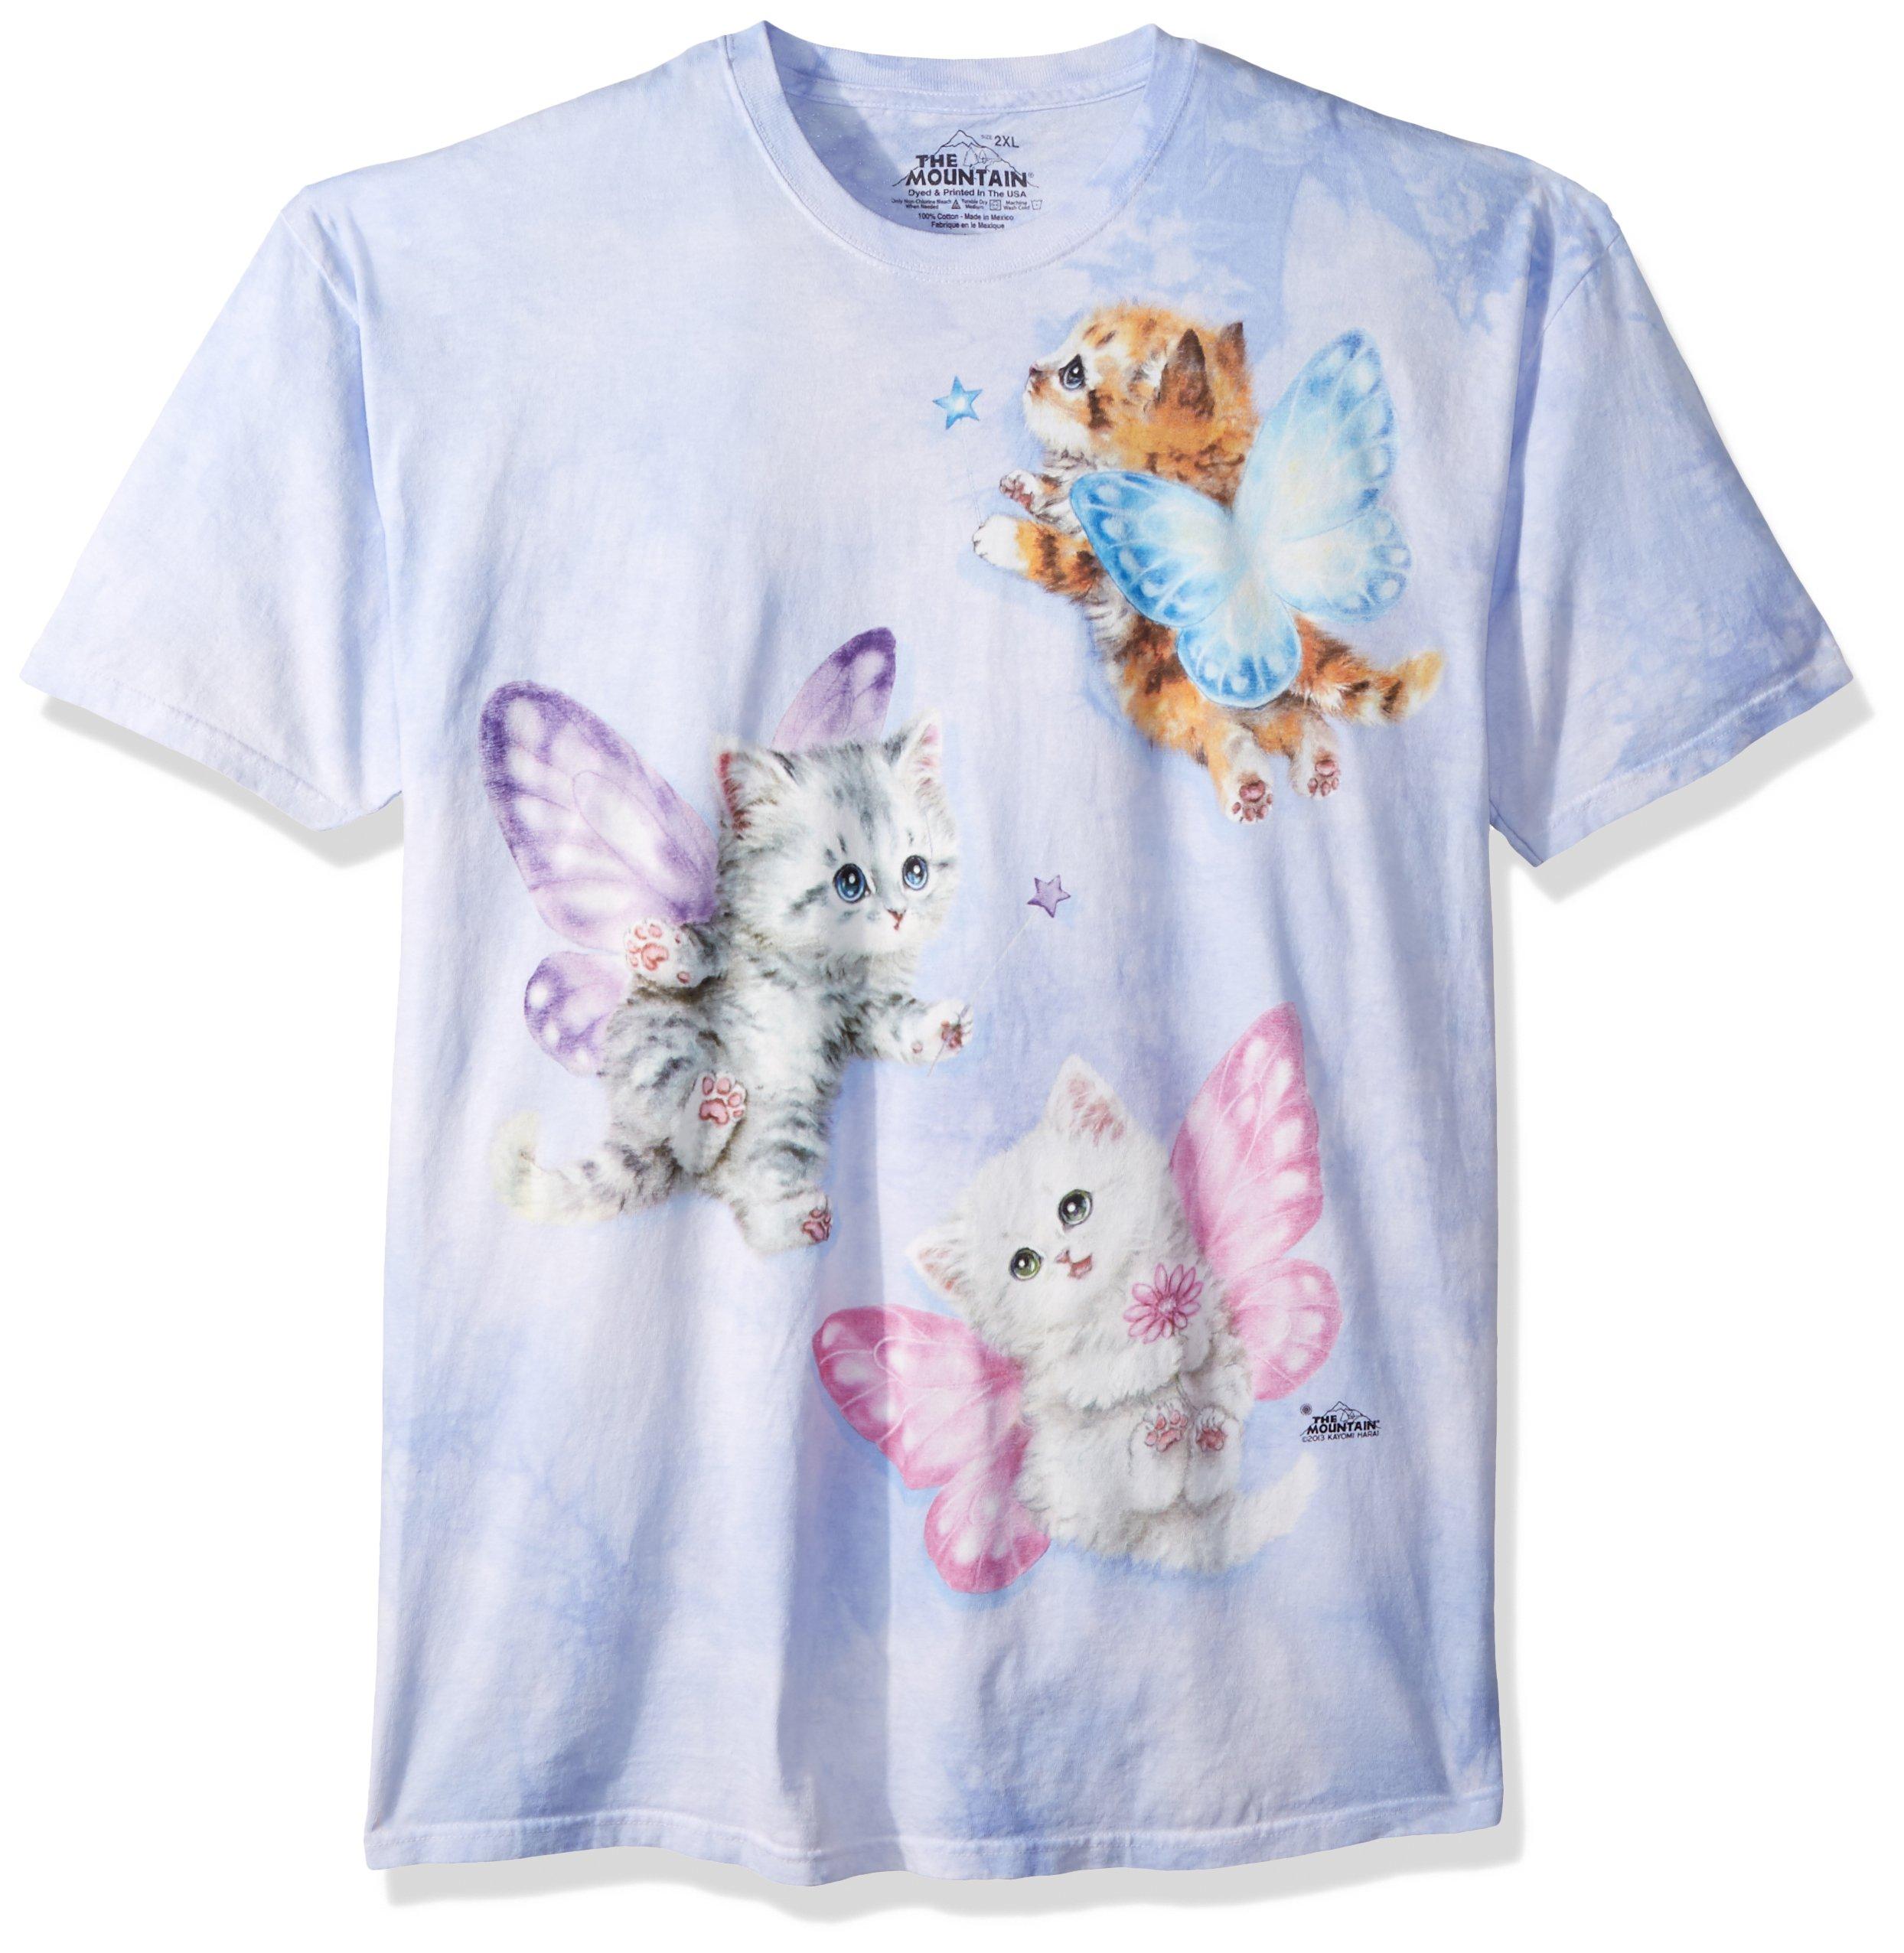 0b37223388f75c The Mountain Kids Butterfly Kitten Fairies T-Shirt